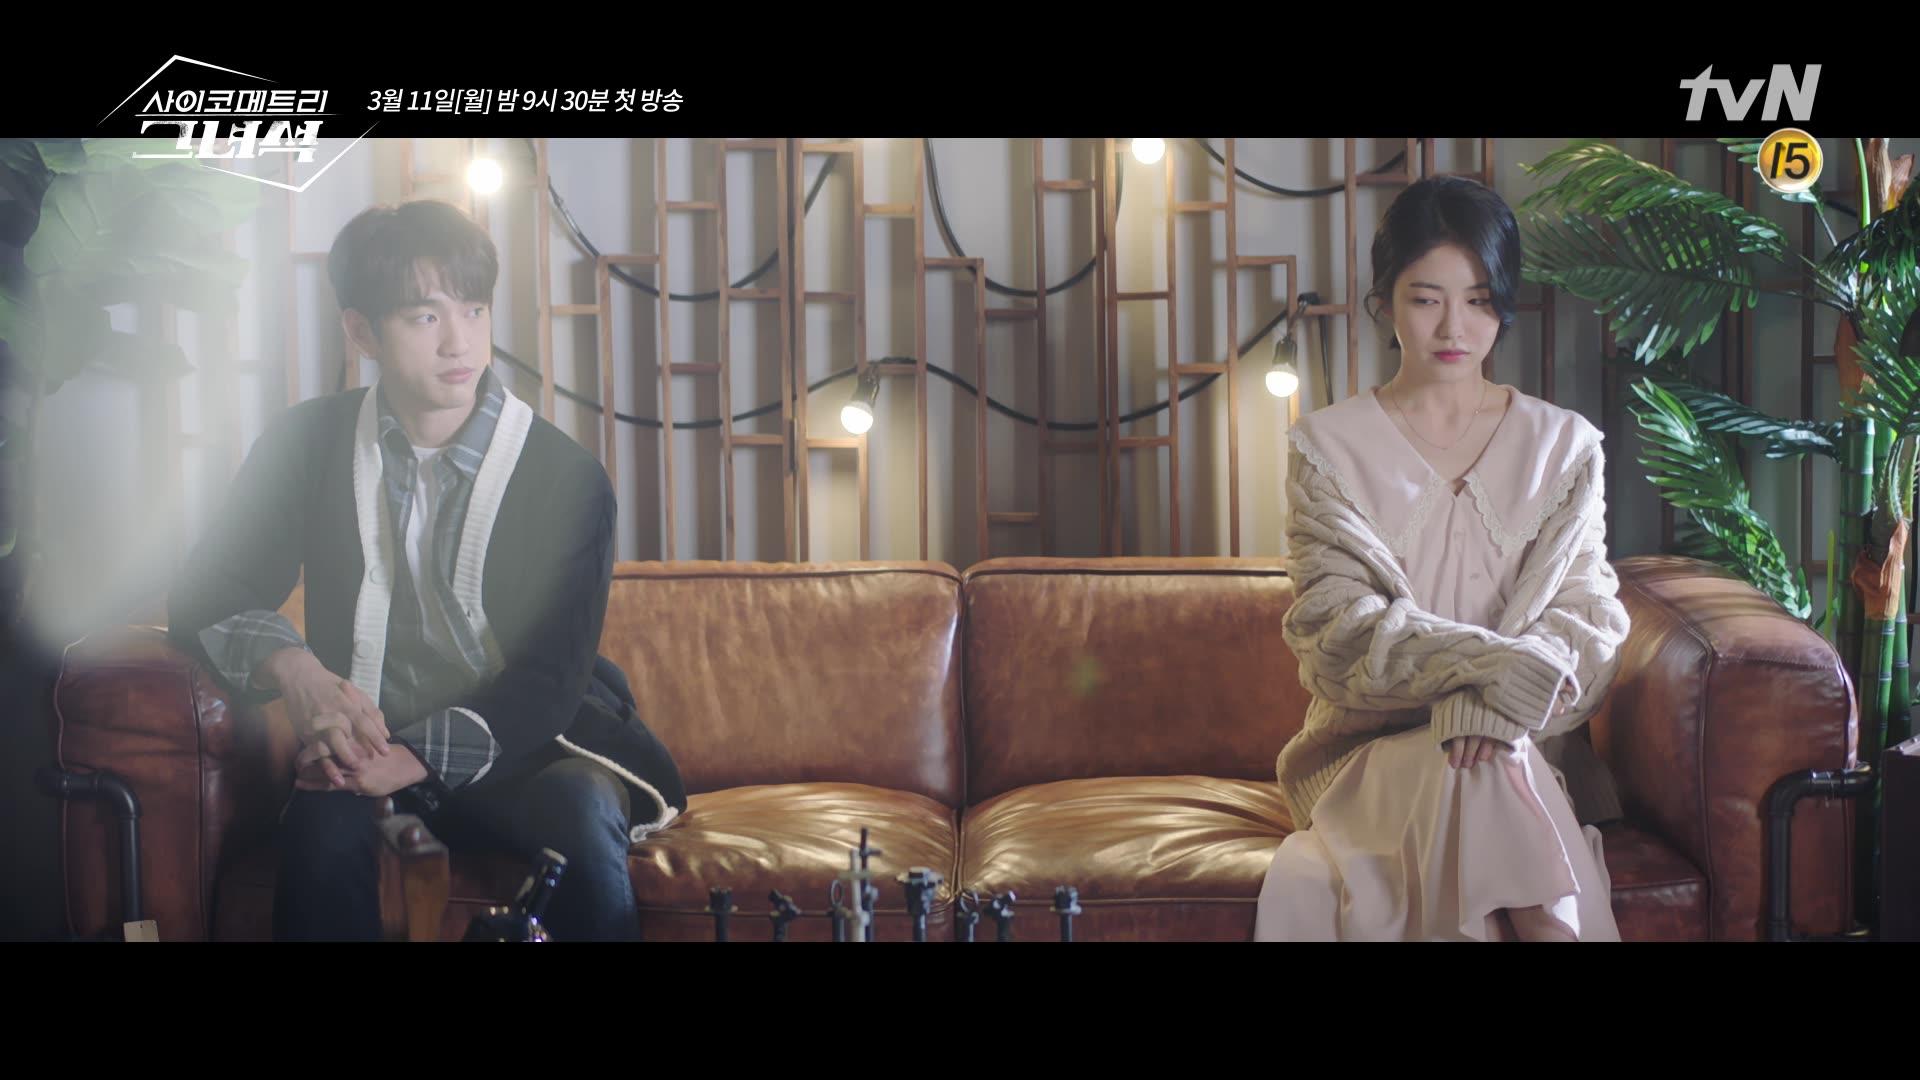 Secret Teaser 2 - Yoon Jae In: Él es sicométrico